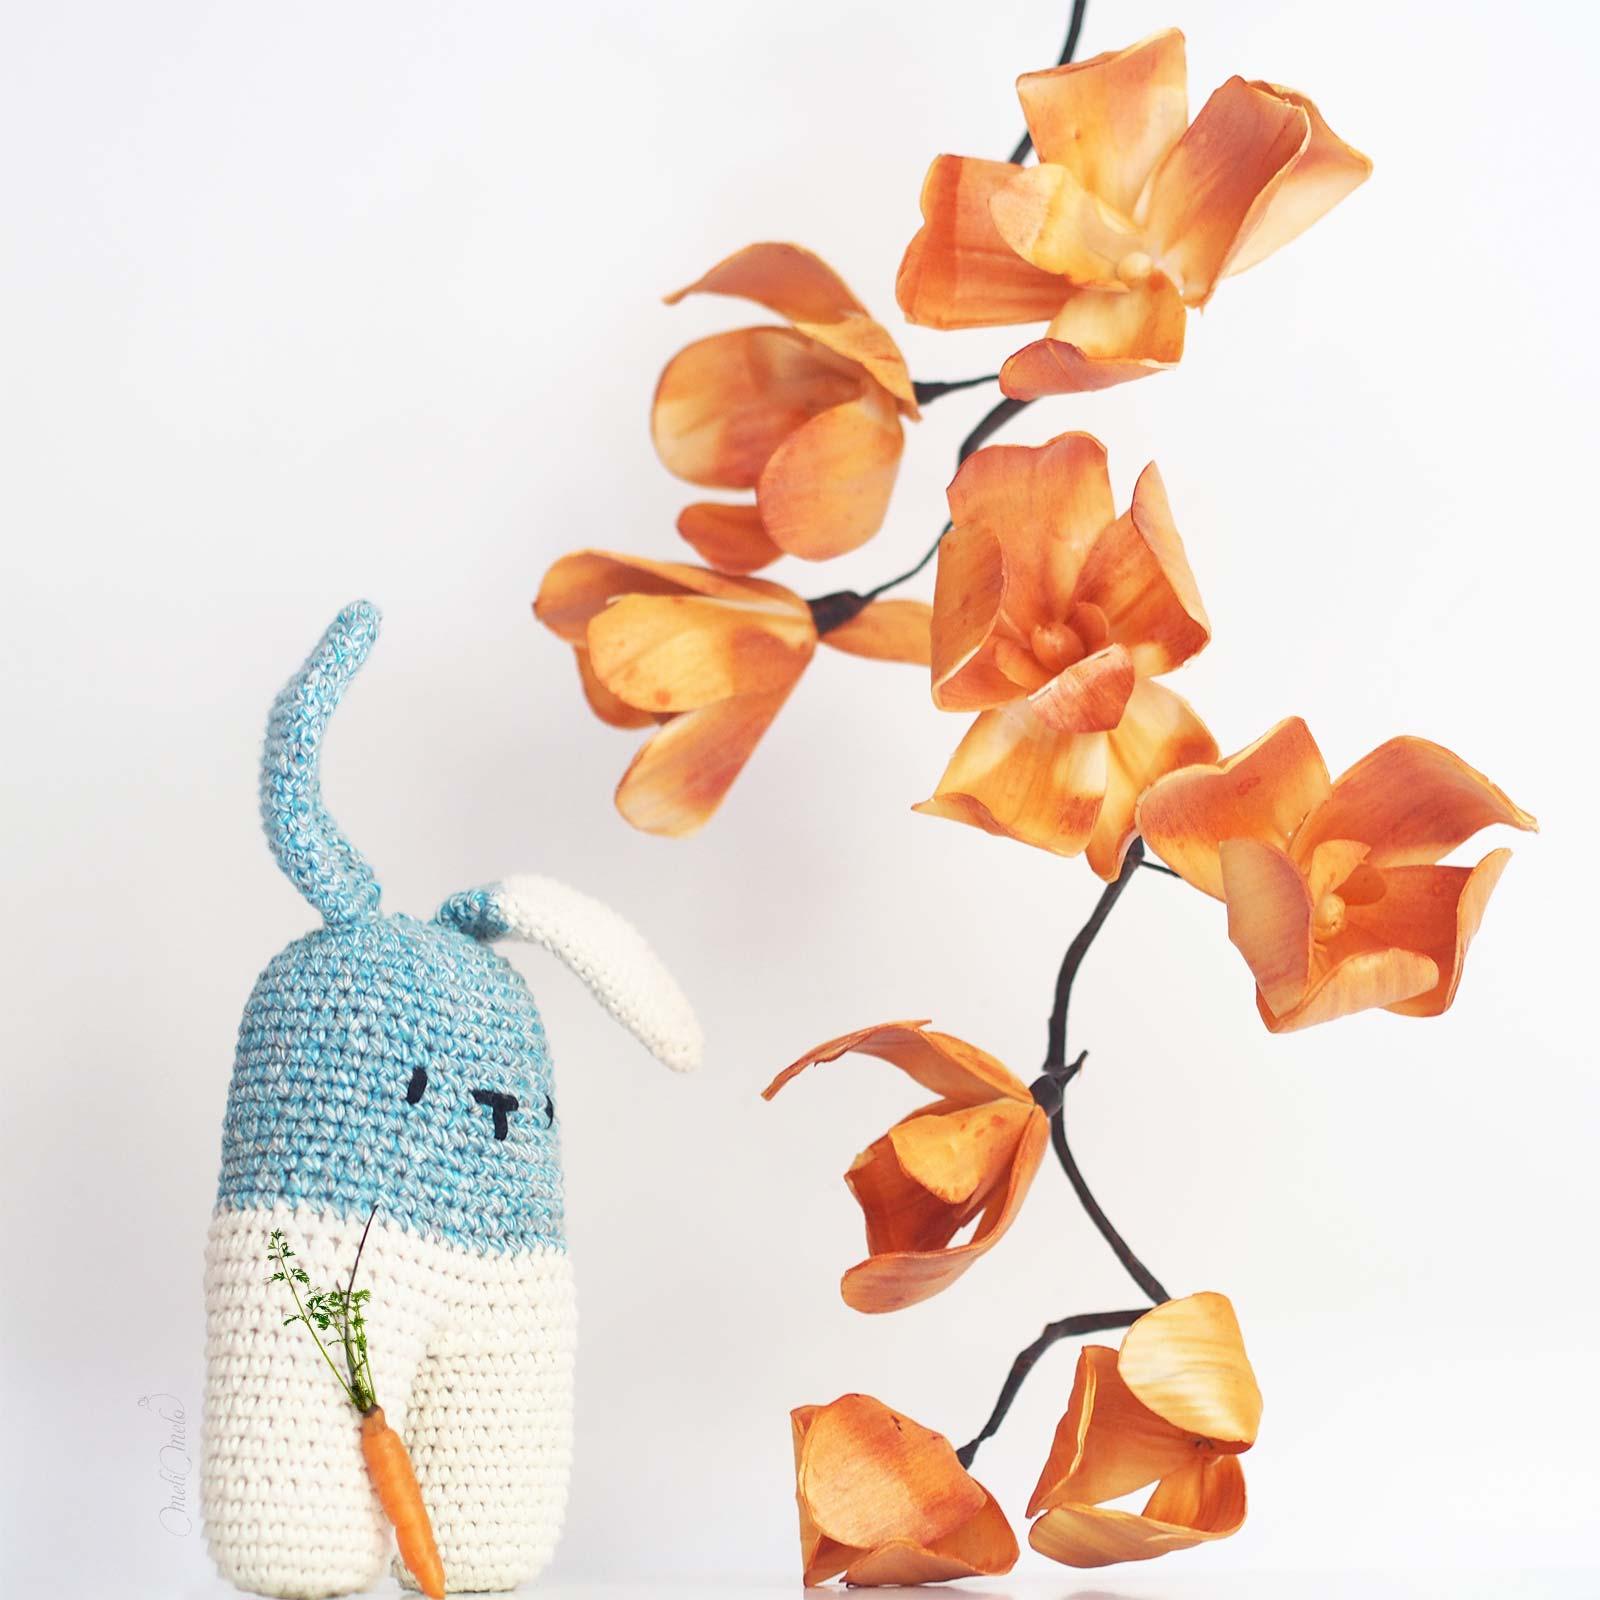 crochet lapin lanukas conejo bipedo happyshinycotton woolandthegang laboutiquedemelimelo